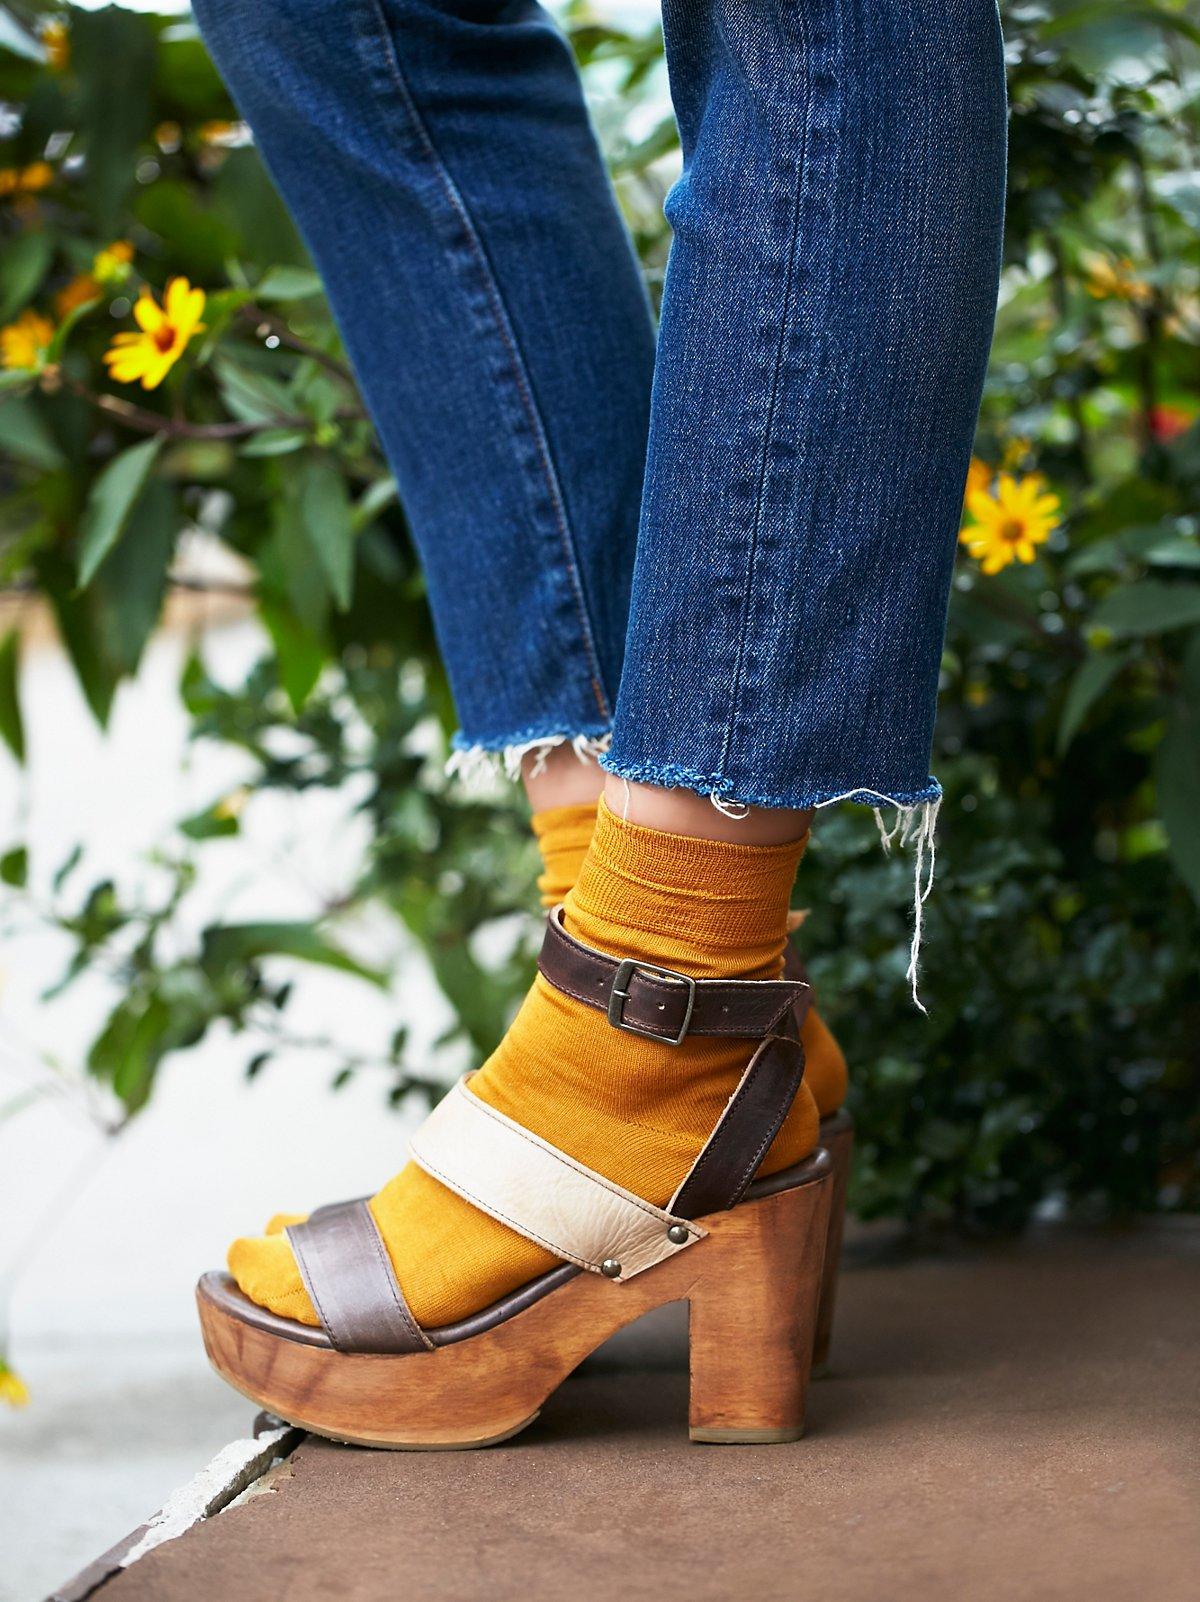 Gold Coast松糕木底鞋